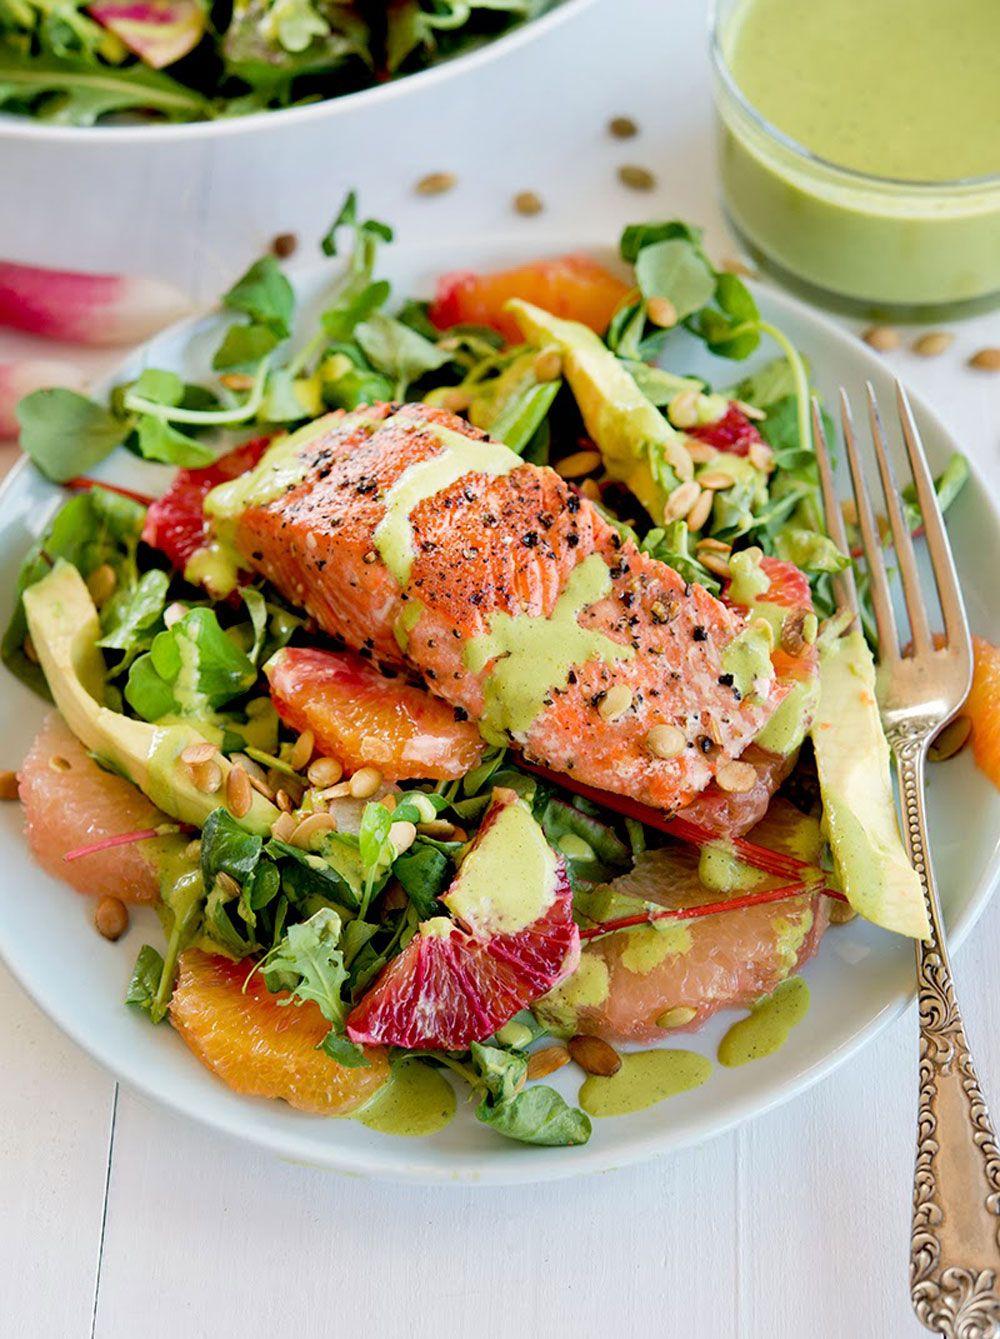 Grapefruit avocado salmon salad with poblanolime dressing